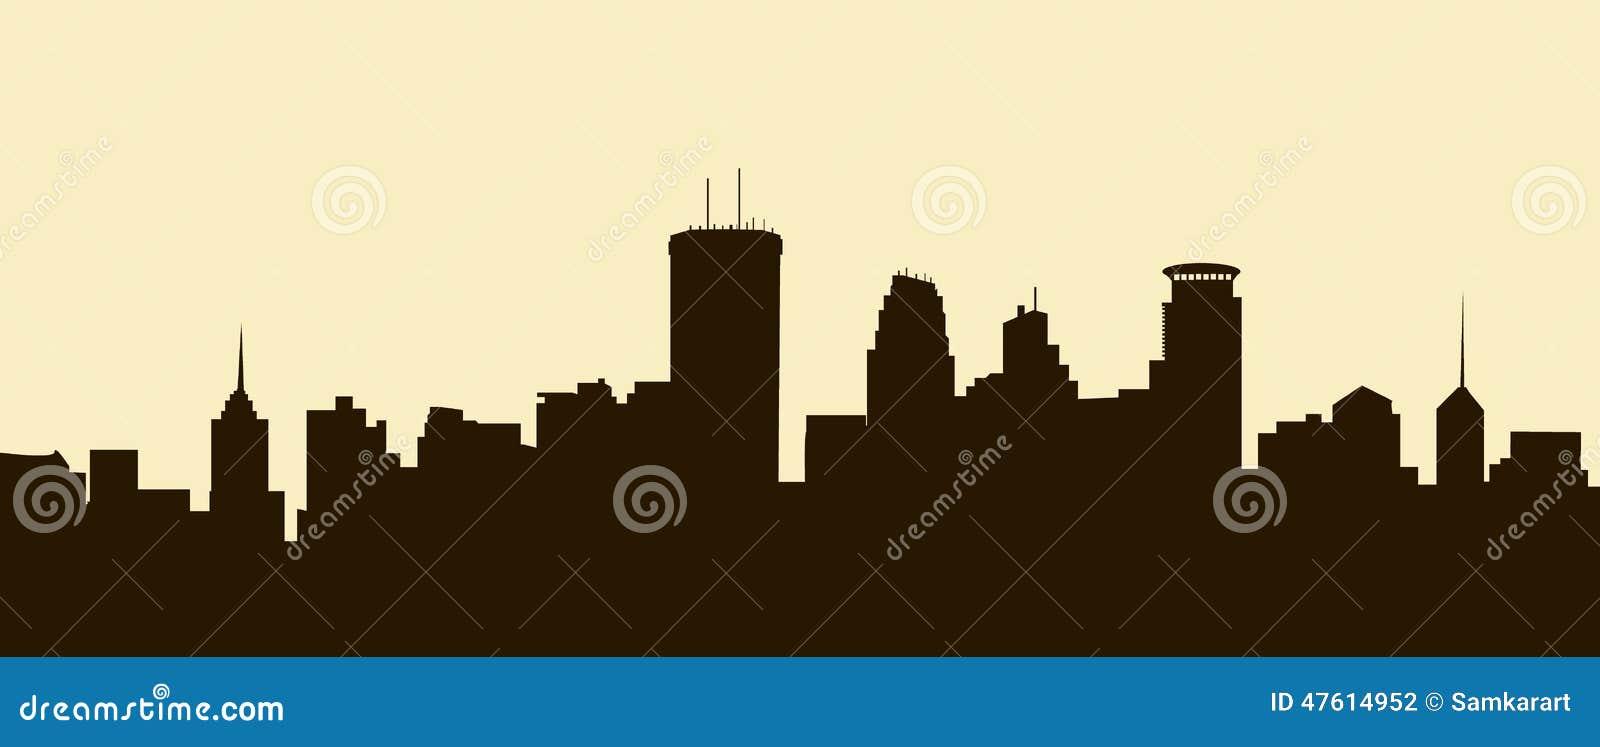 Minneapolis Skyline Vector Stock Vector Image 47614952